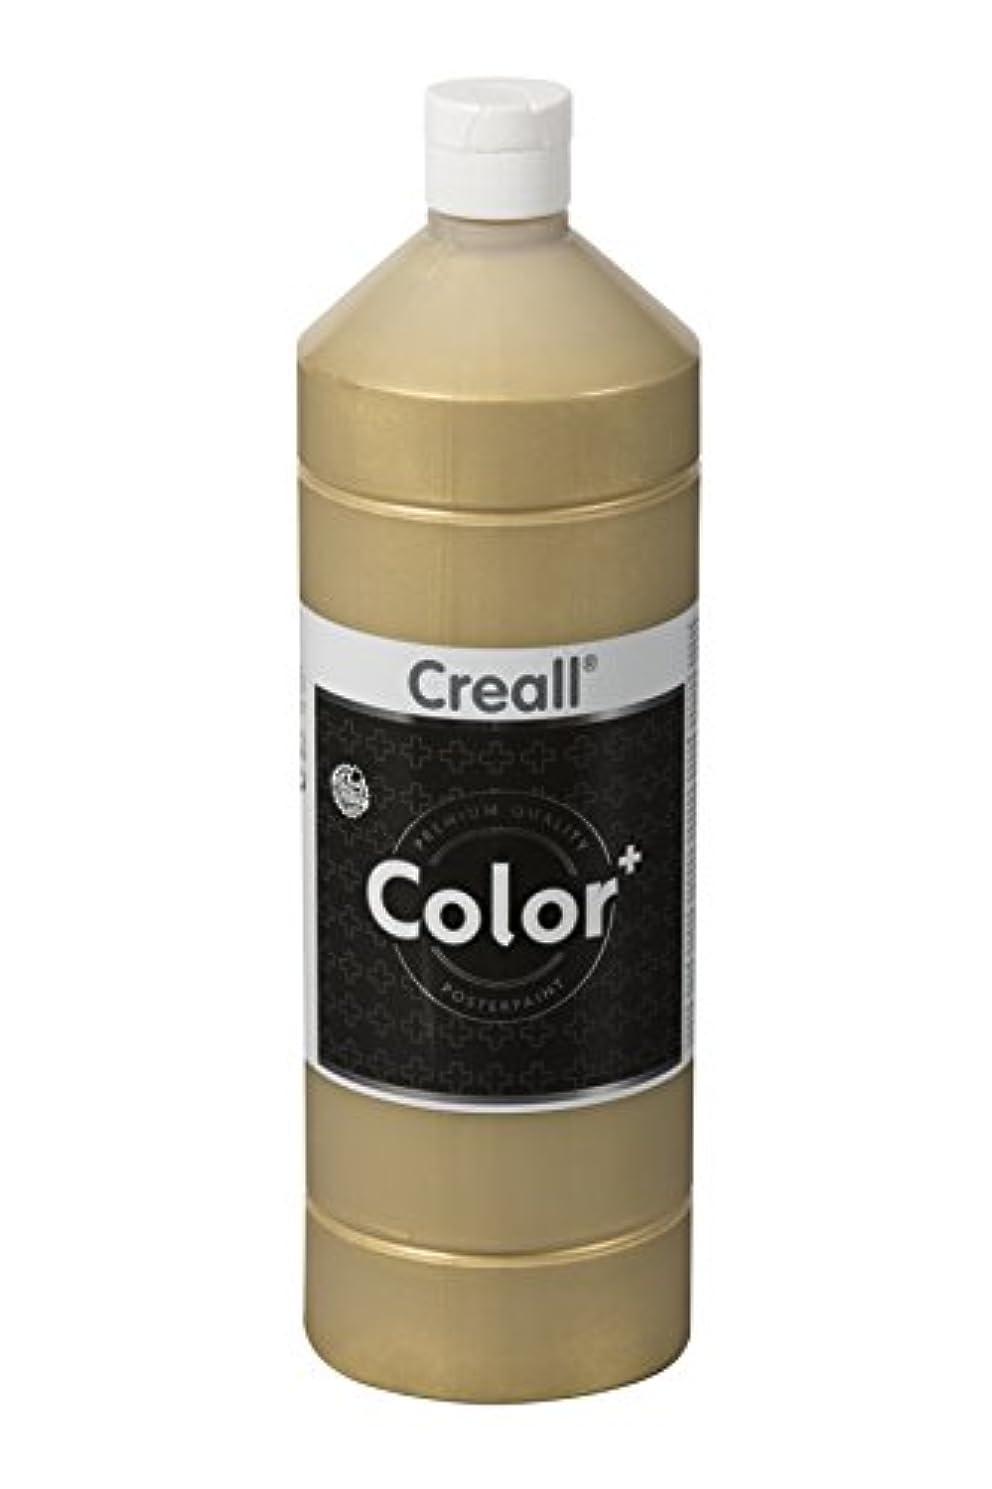 Creall Havo20031 500 ml 11 Gold Havo Glass Window Color Bottle